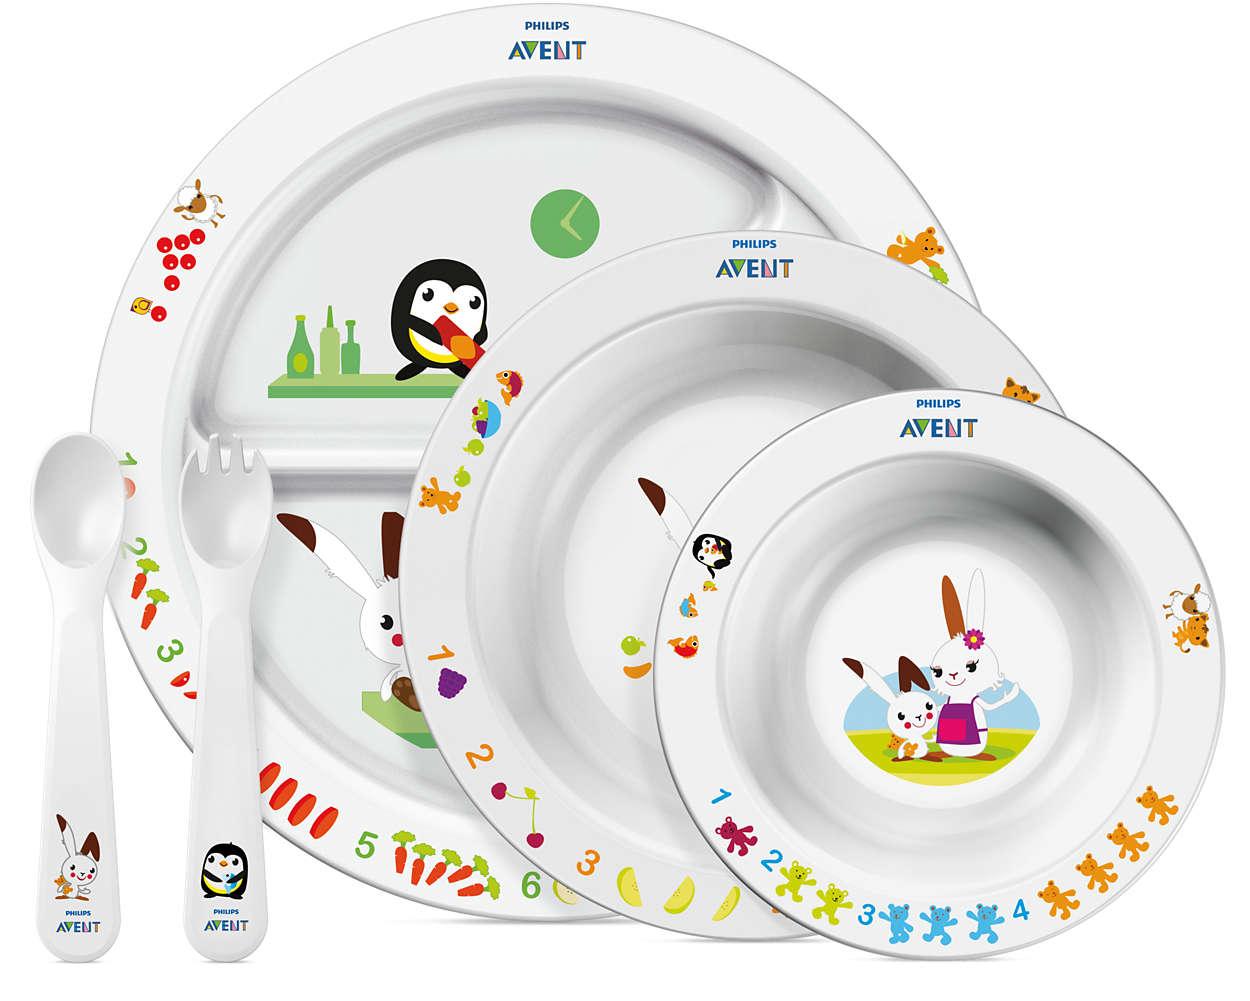 Opfordrer til spisning via sjov indlæring